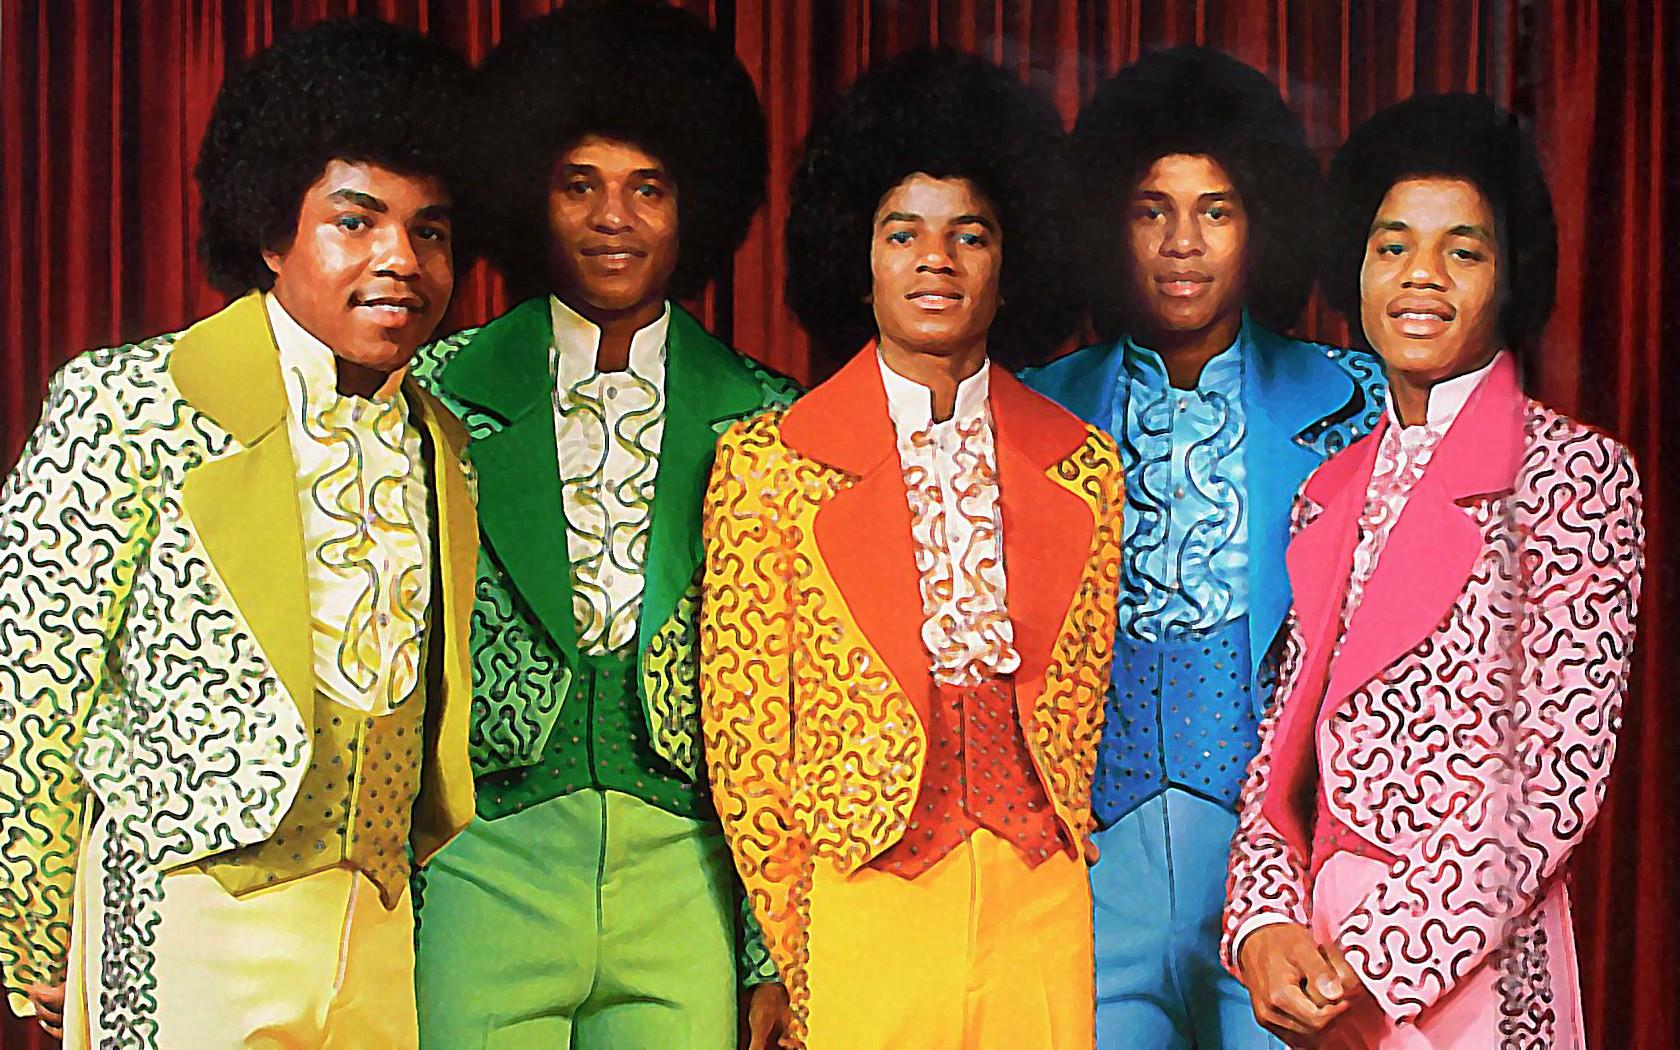 Jackson Five The ABC